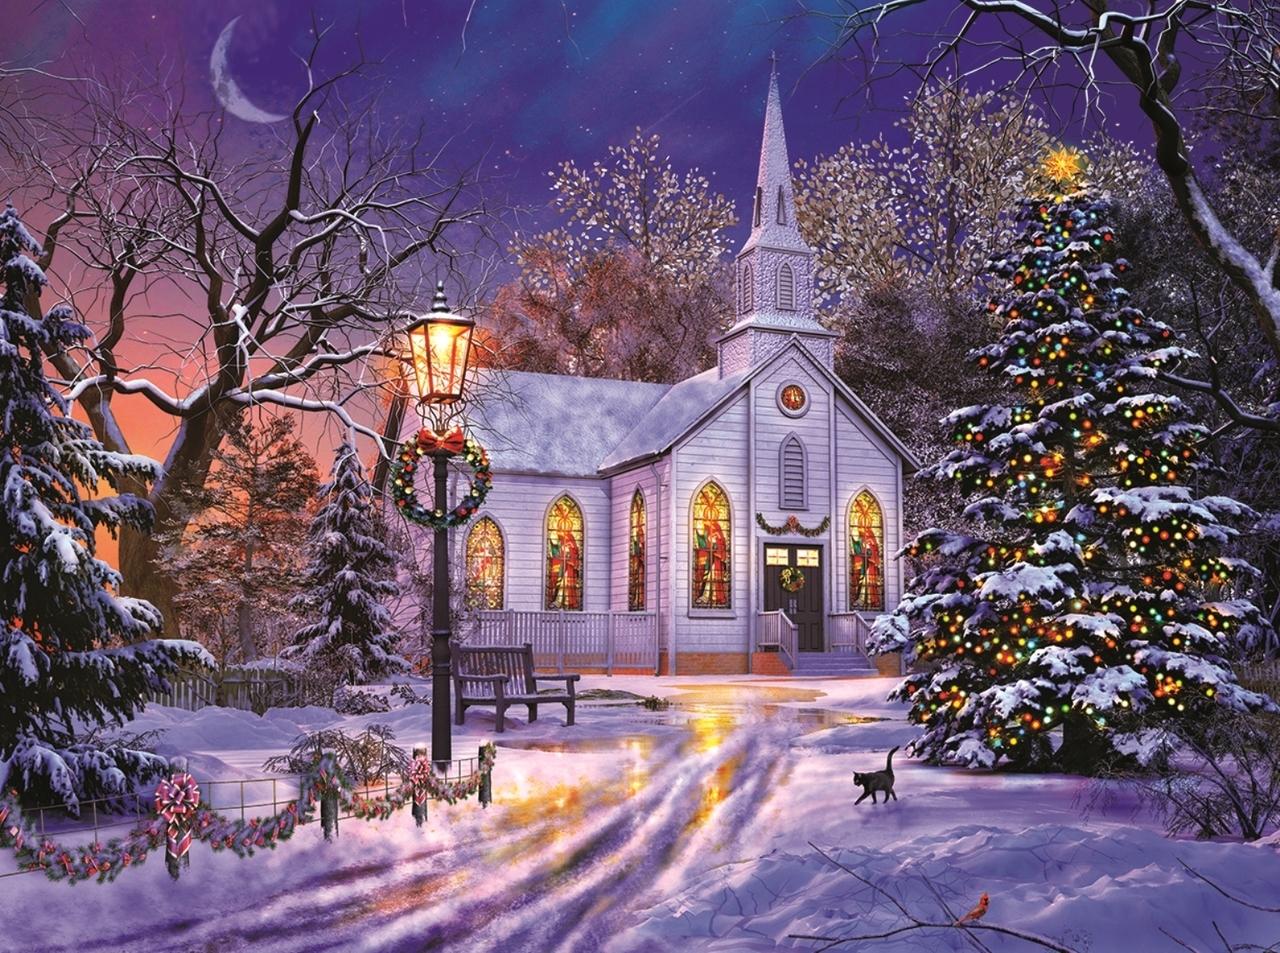 dominic-davison-the-old-christmas-church